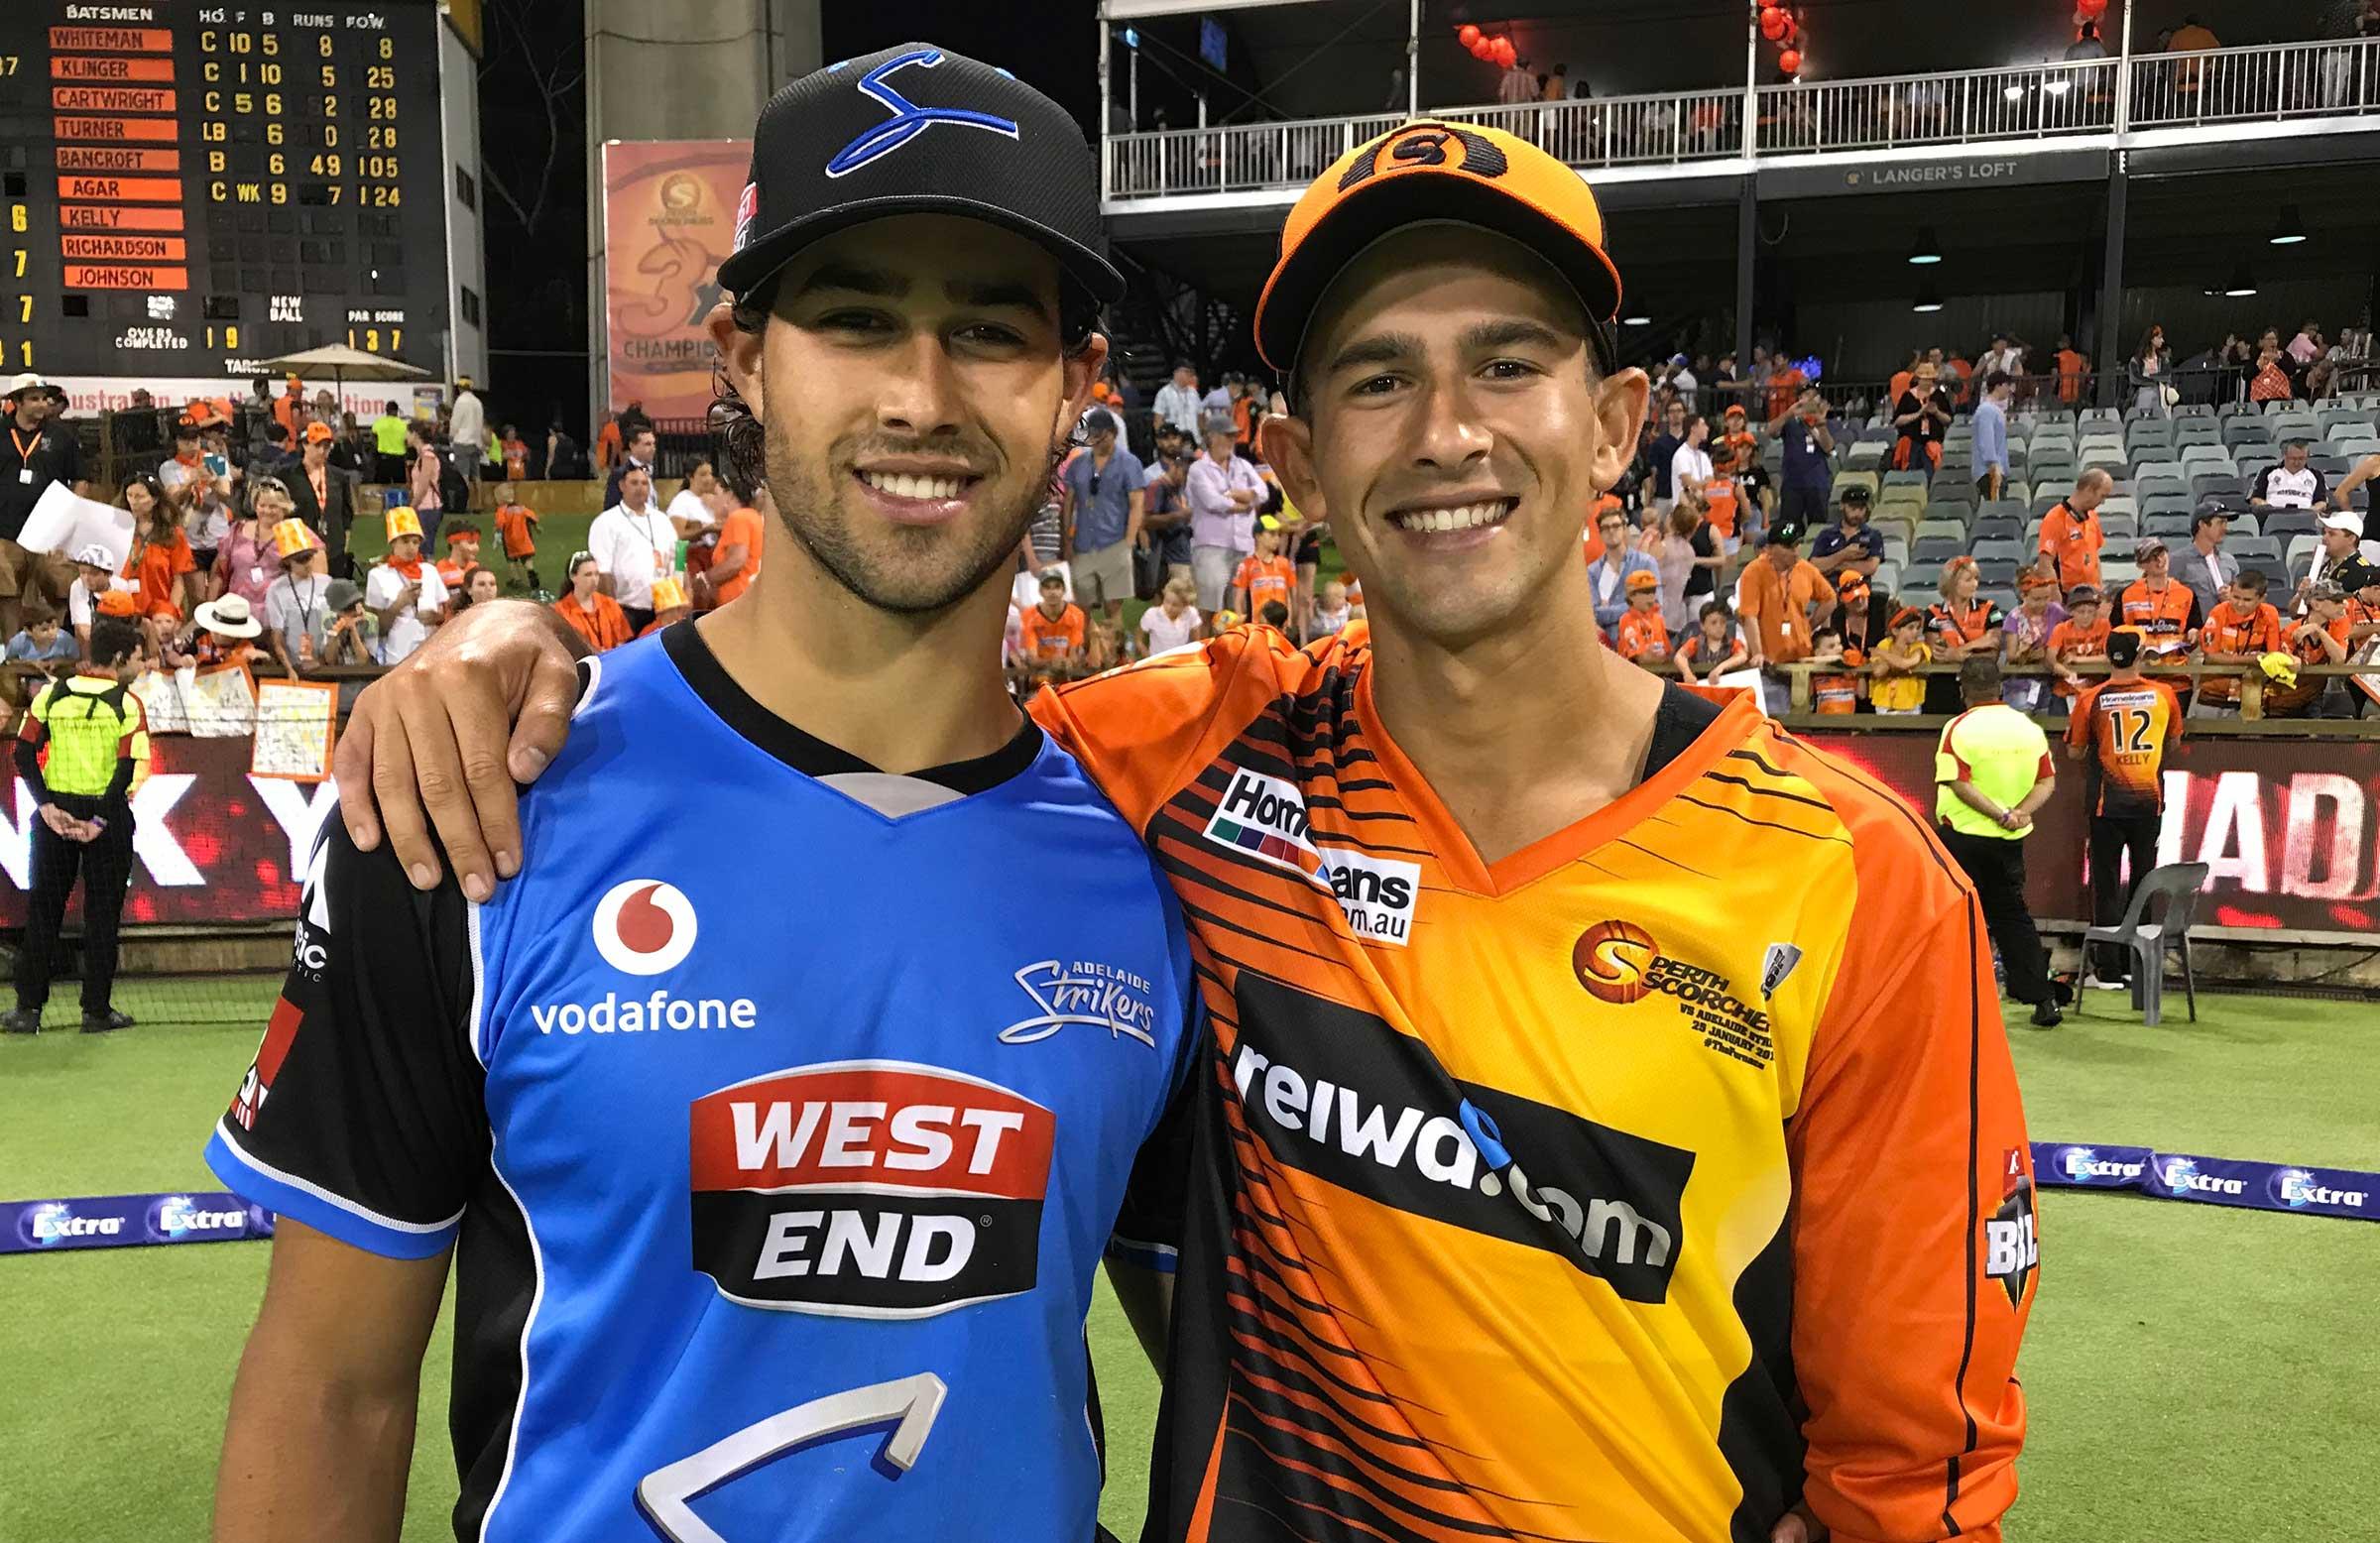 Wes and Ashton Agar at the WACA // cricket.com.au